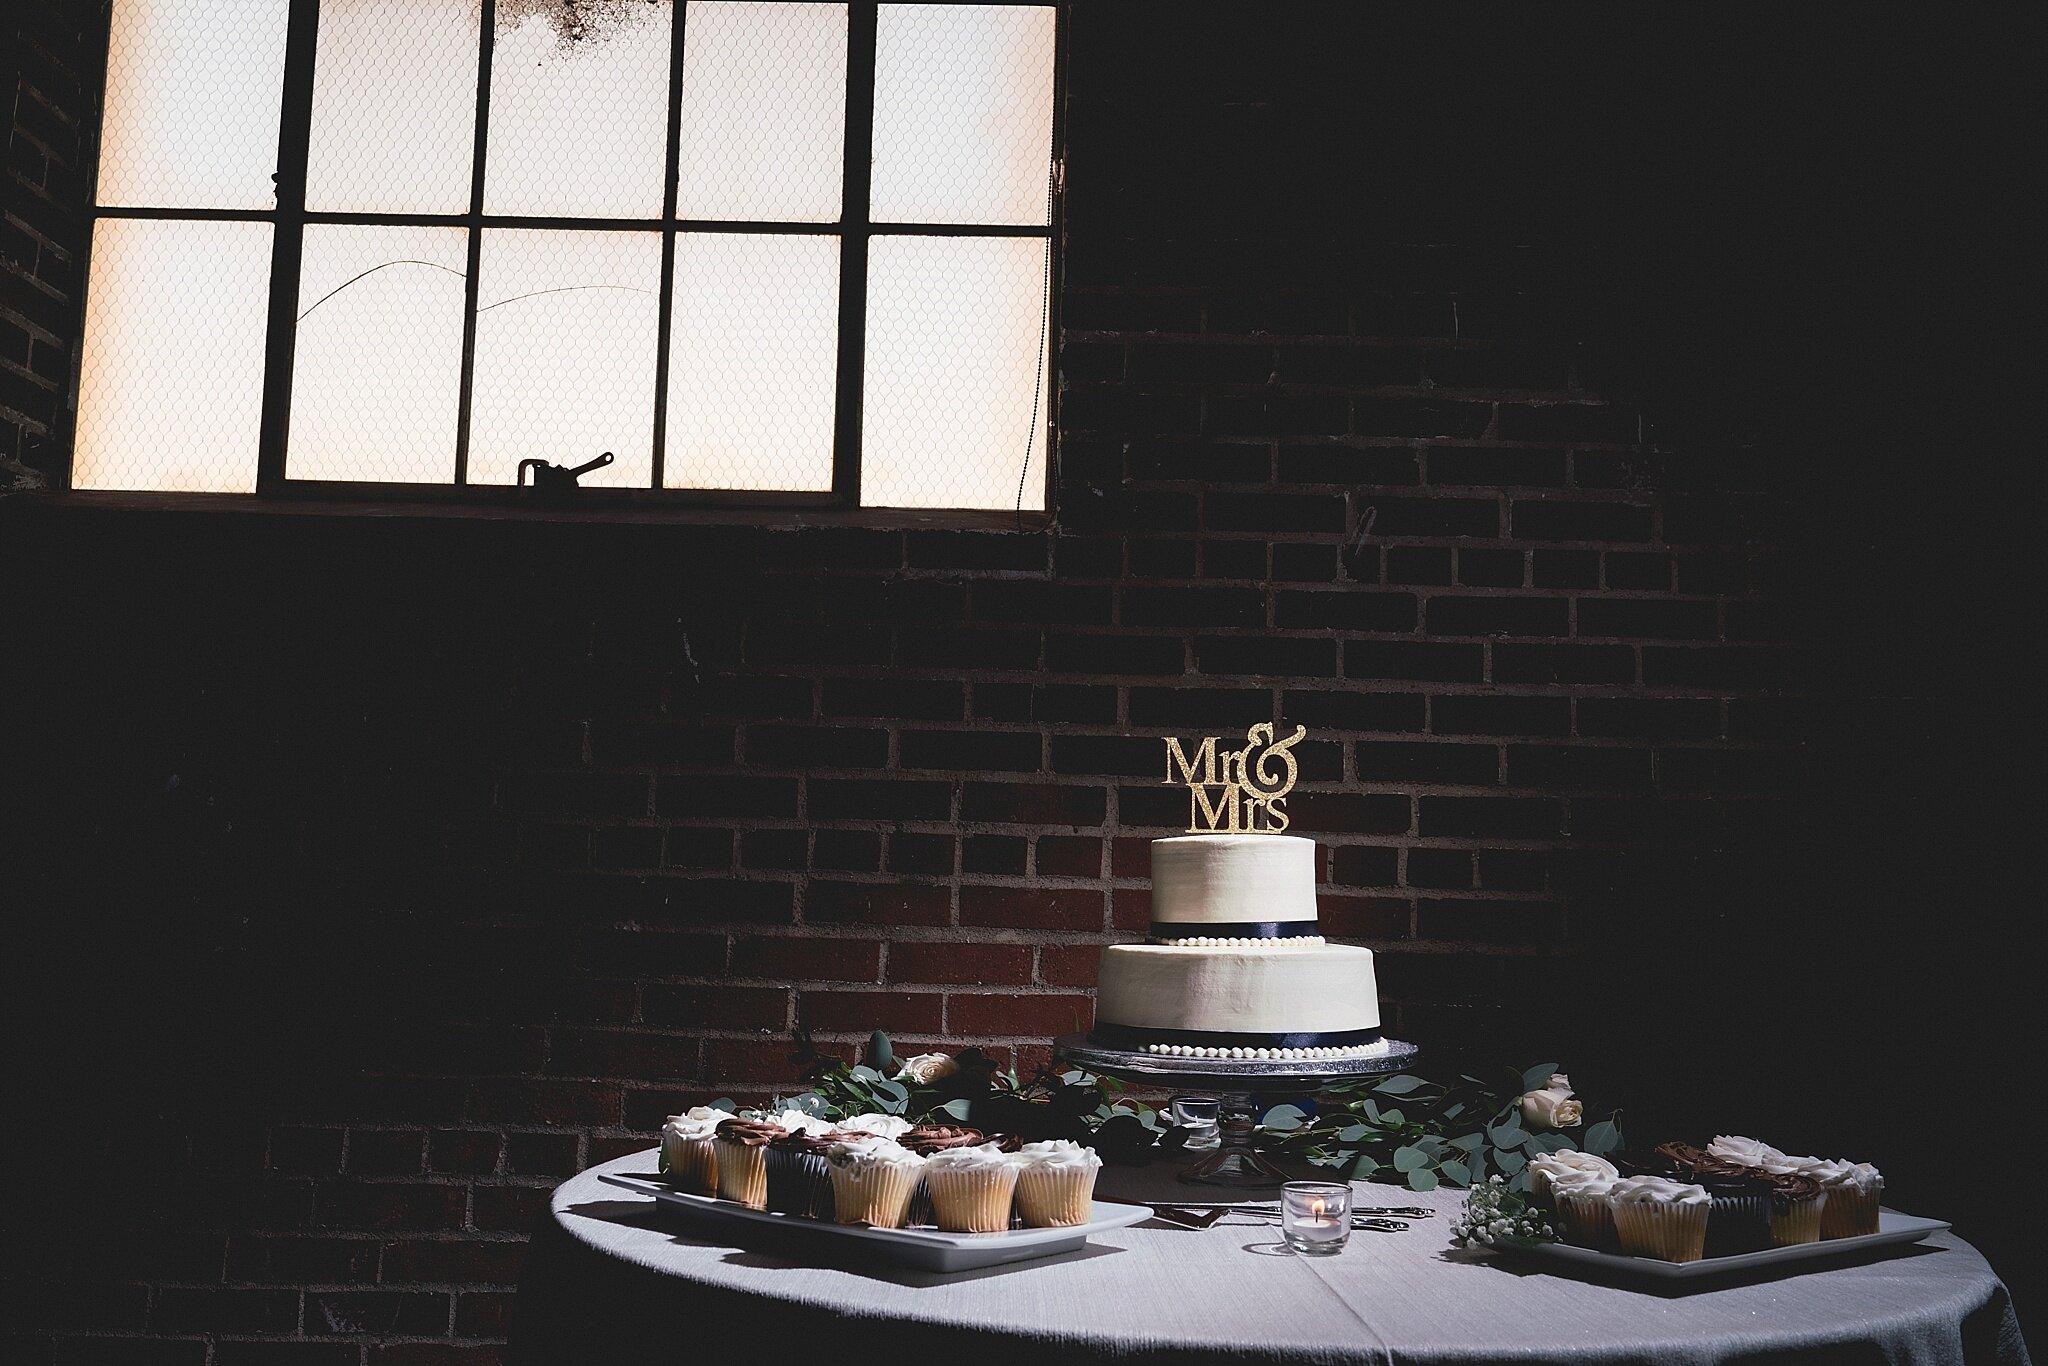 Cookery-Durham-NC-Photographer-186.jpg